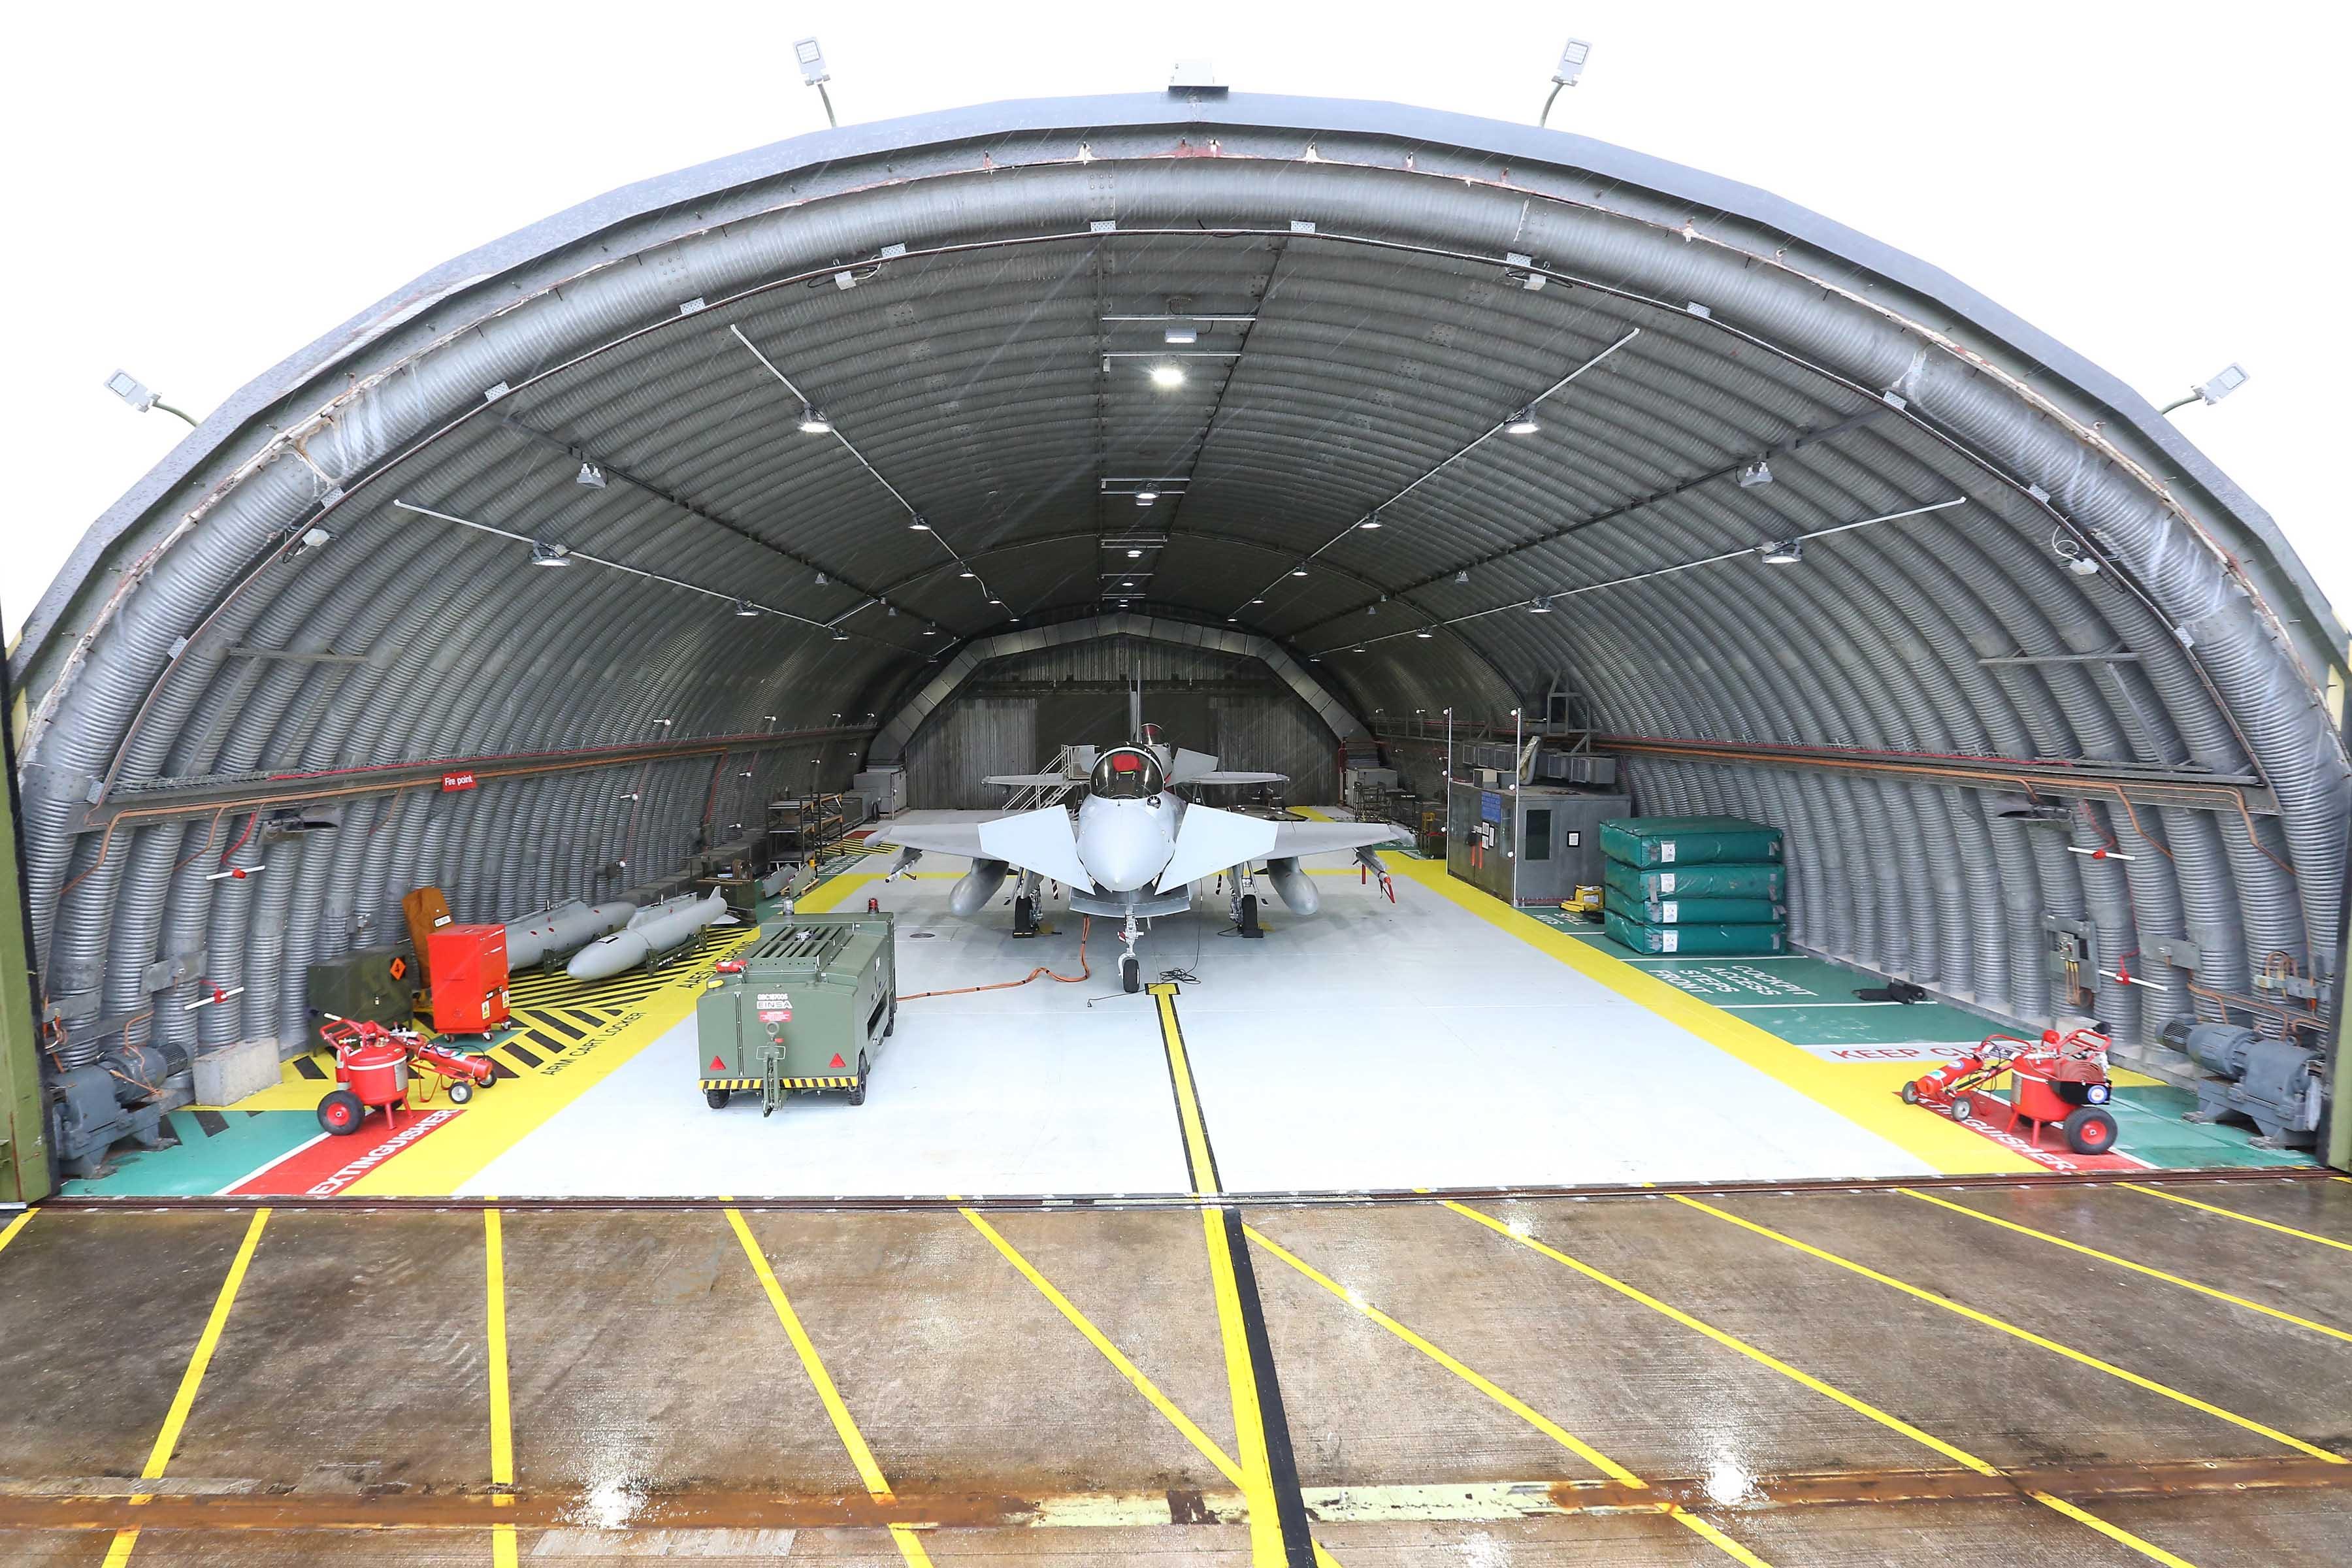 RAF-Lossiemouth-Typhoon-hangar-Hardened-